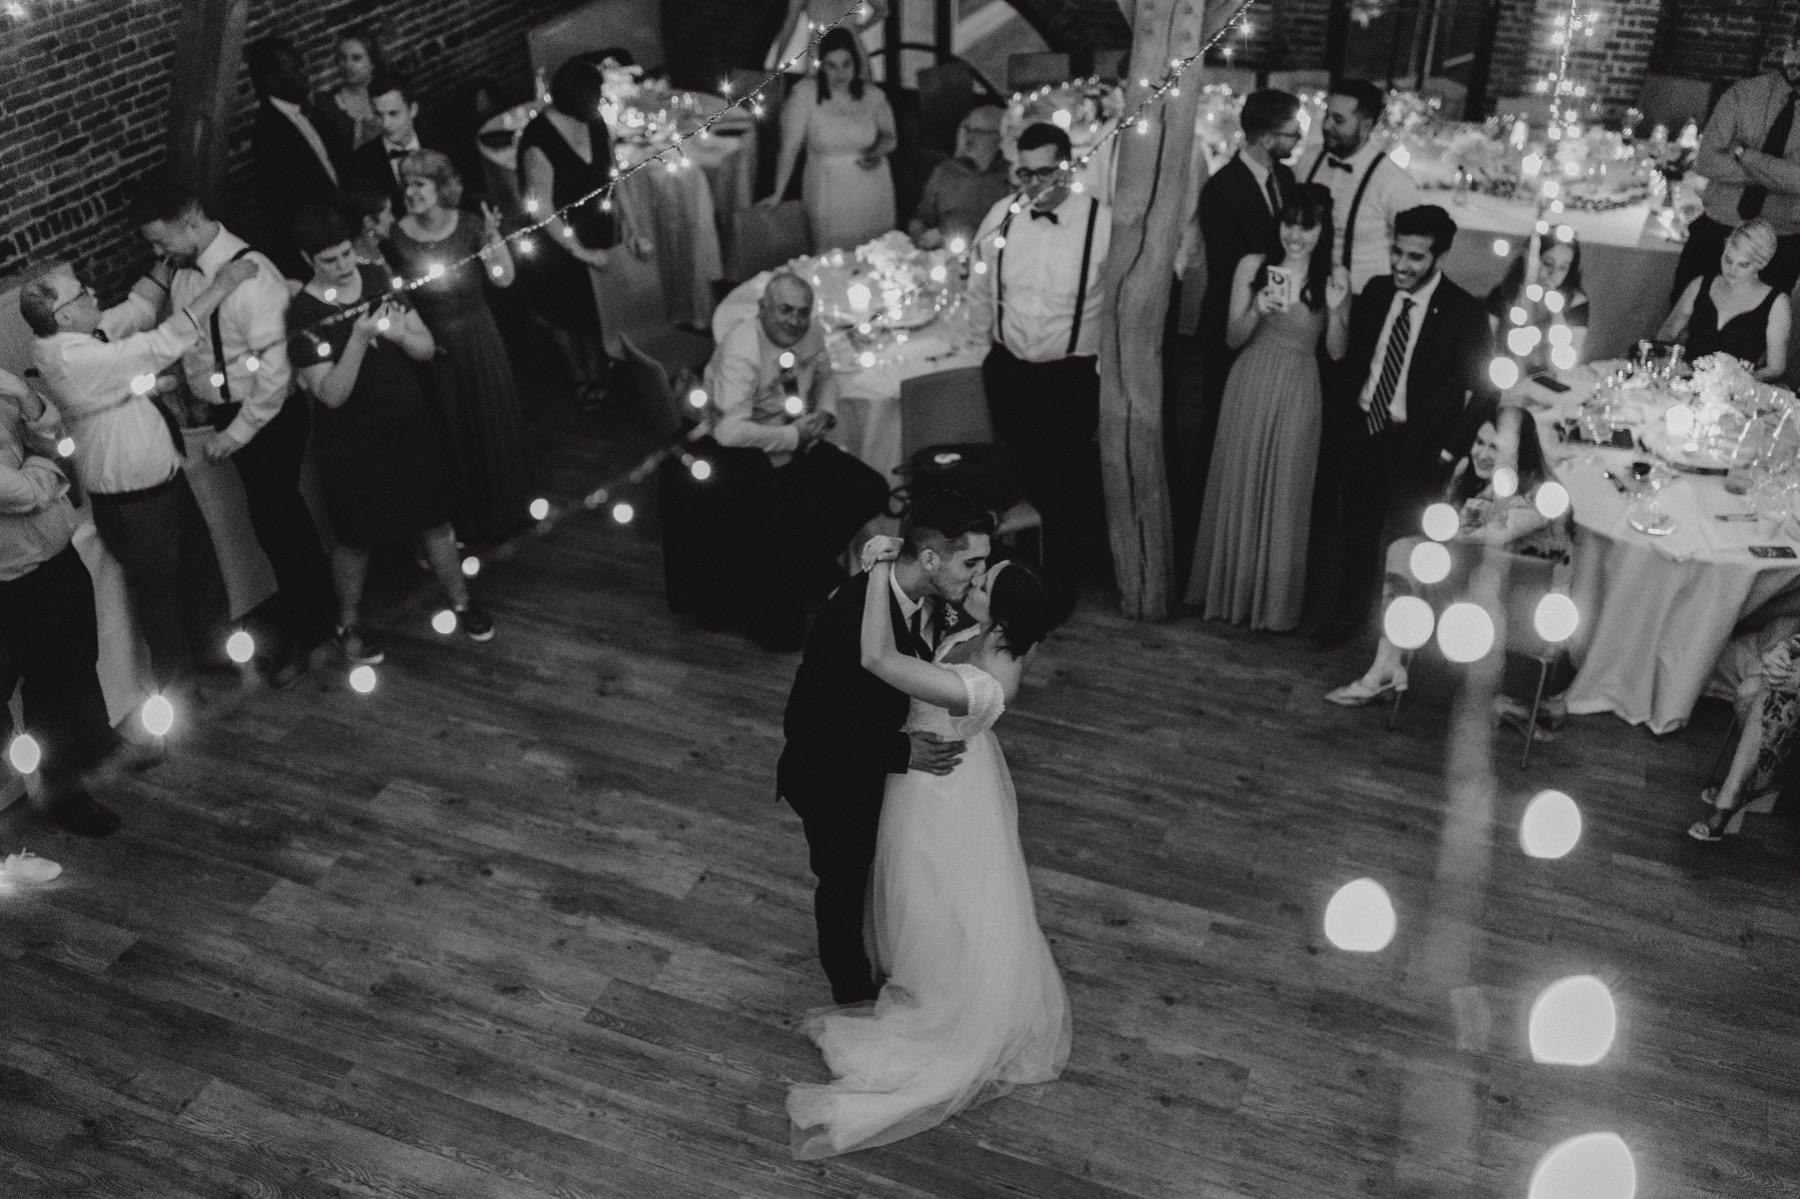 Belgian wedding dance